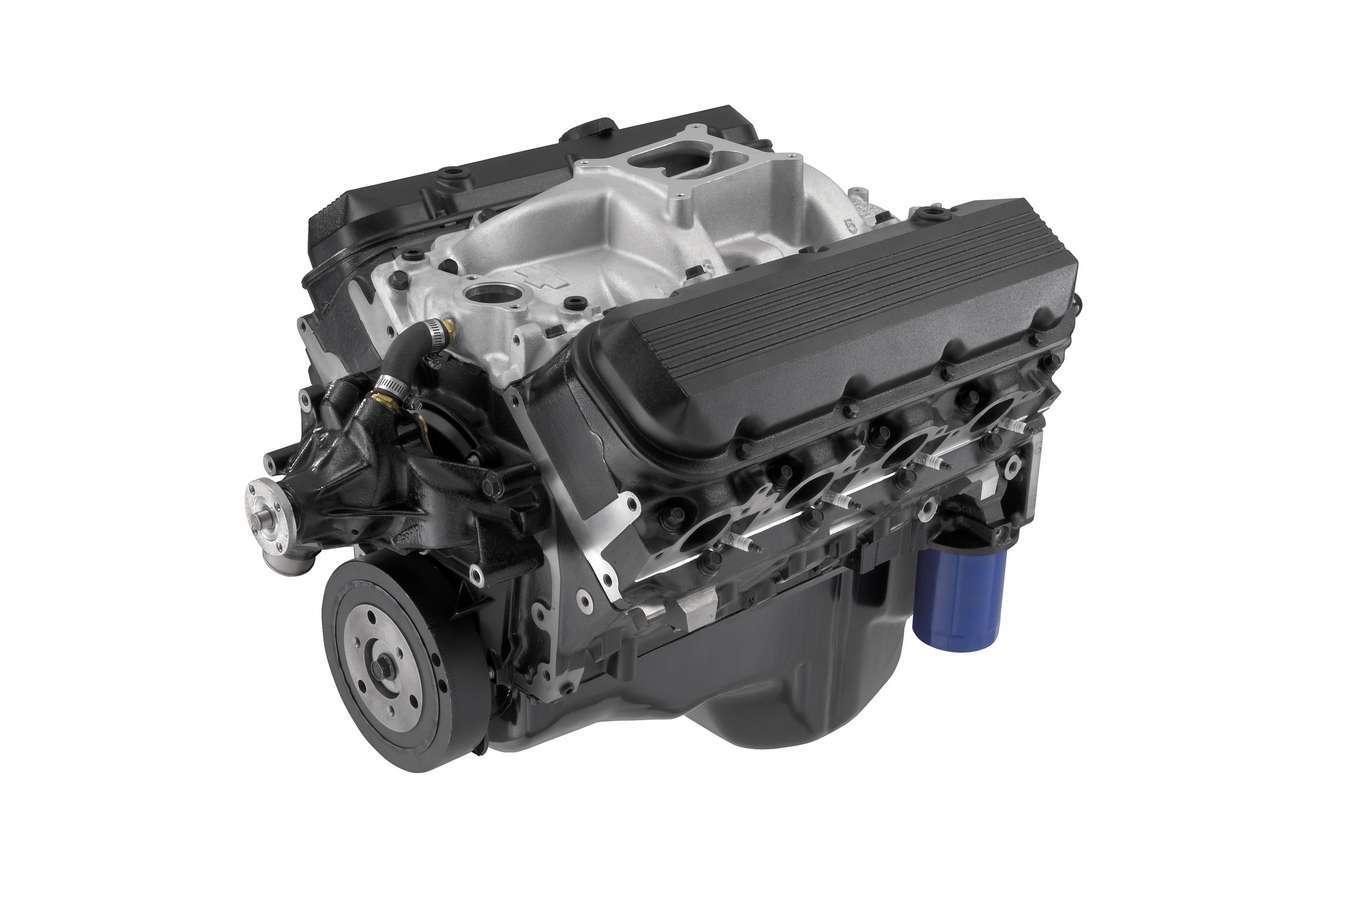 Chevrolet Performance Crate Engine - BBC 502/461HP